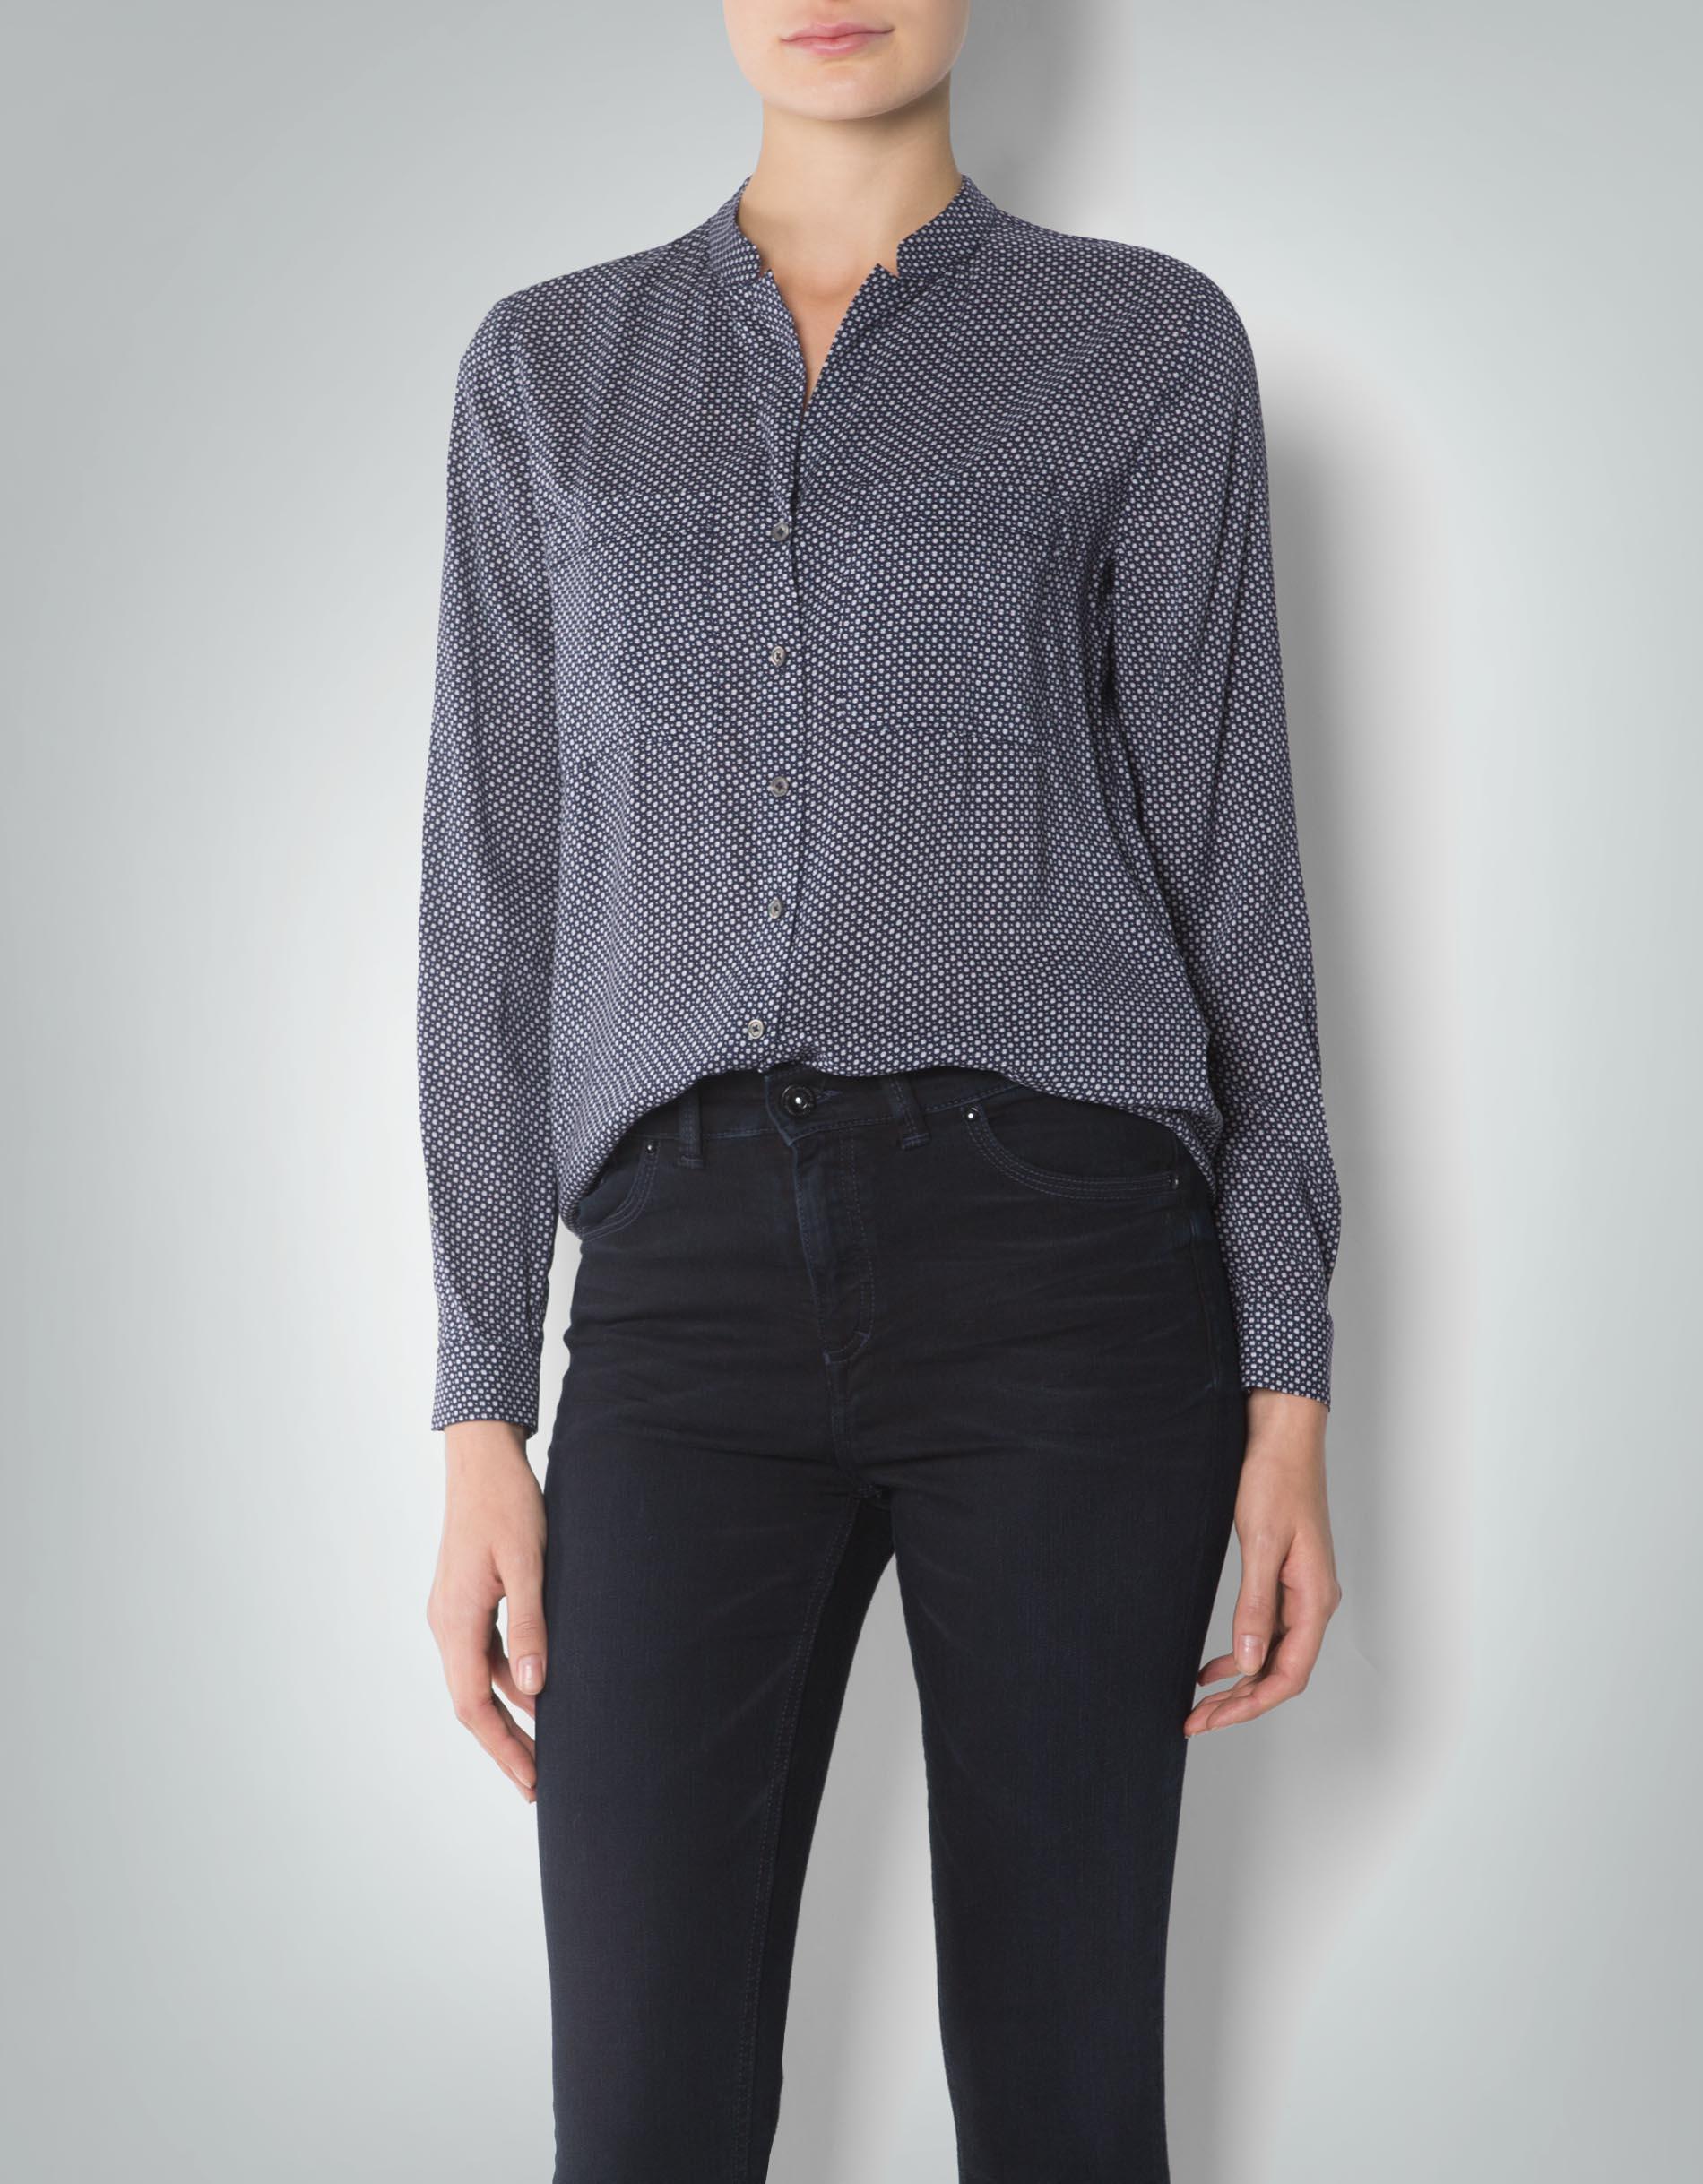 tommy hilfiger damen bluse mit mini dessin empfohlen von. Black Bedroom Furniture Sets. Home Design Ideas